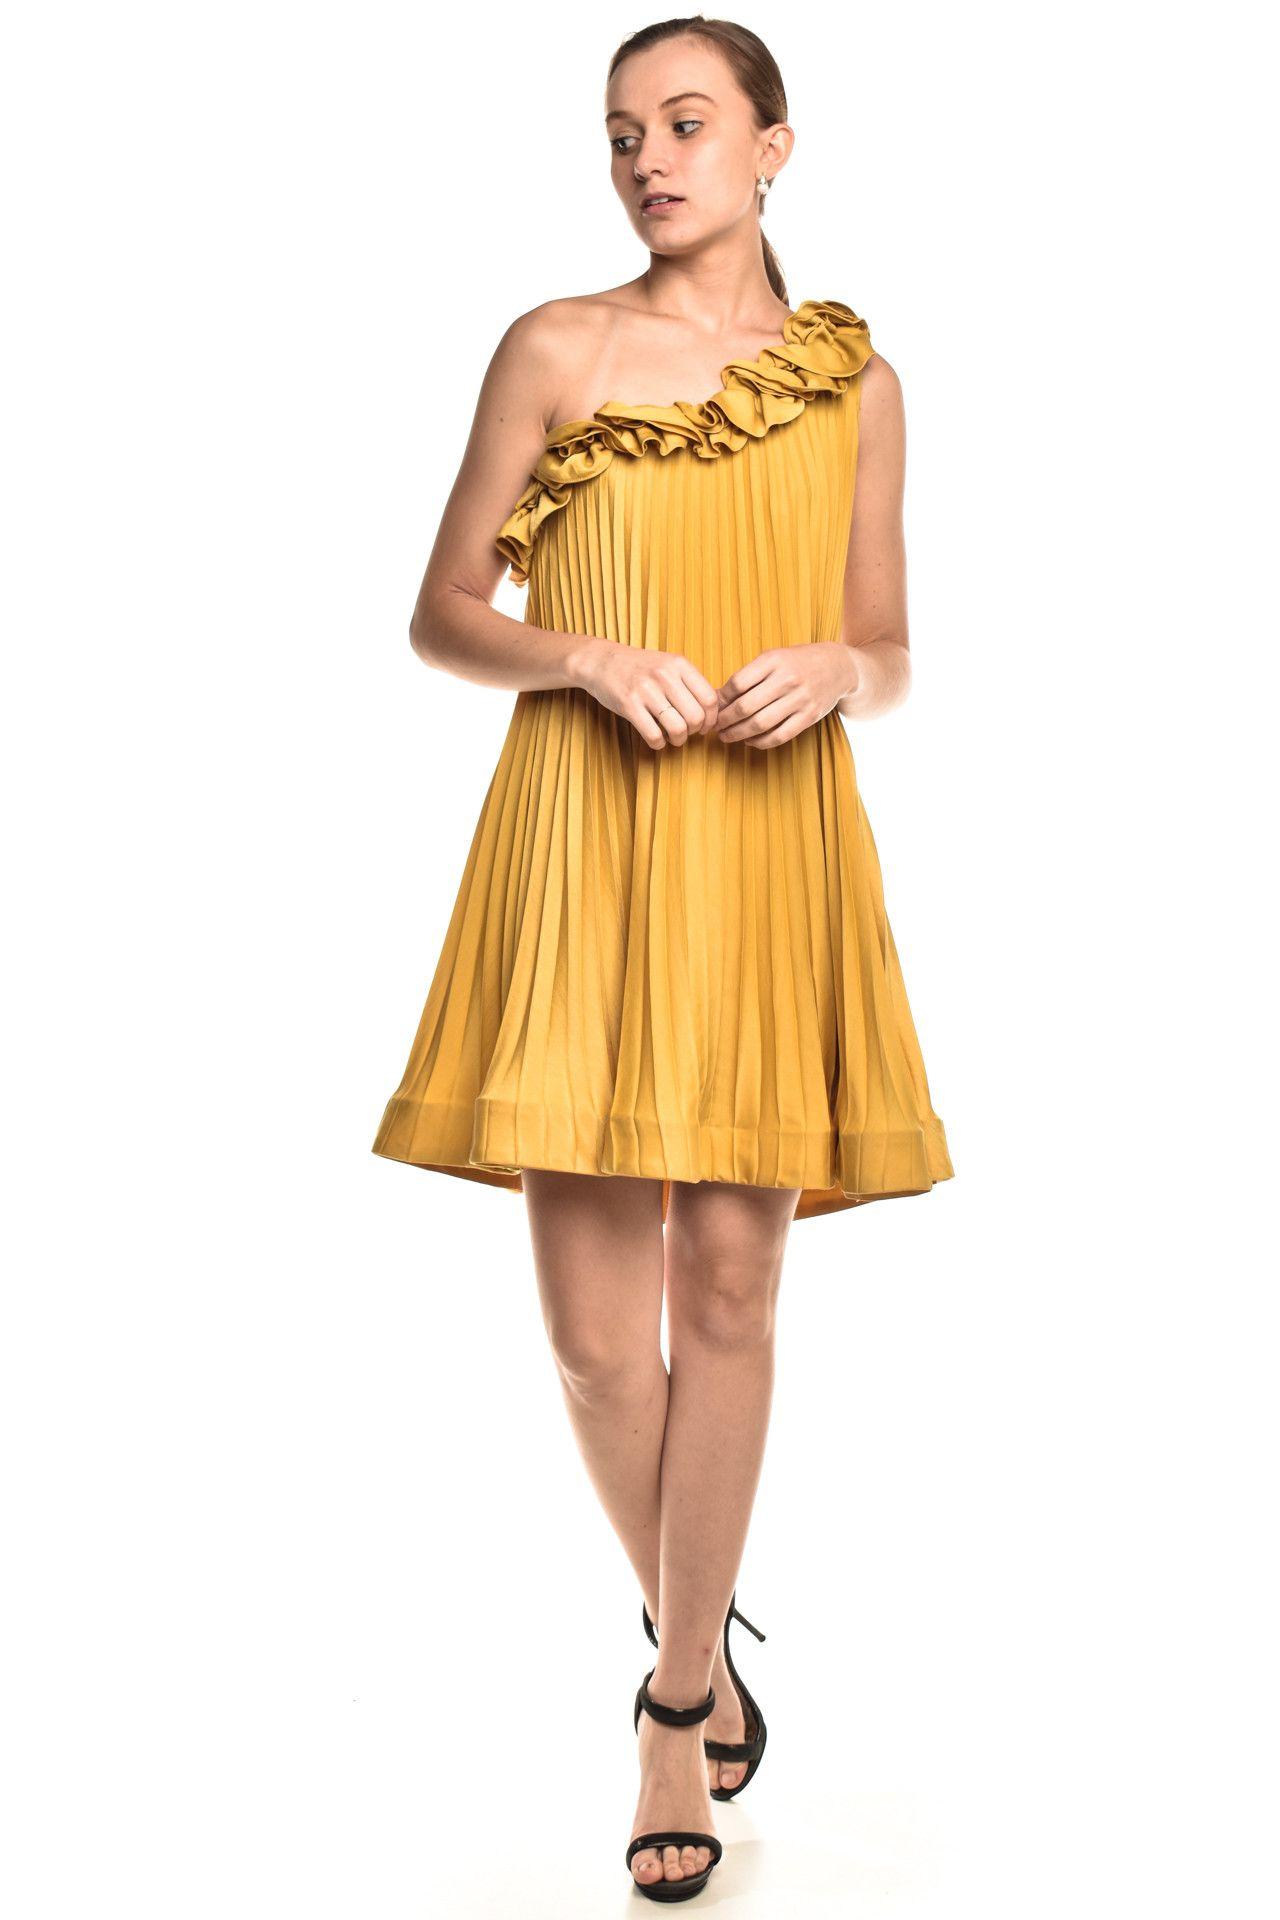 Bcbgmaxazria - Vestido Babados Yellow - Foto 3